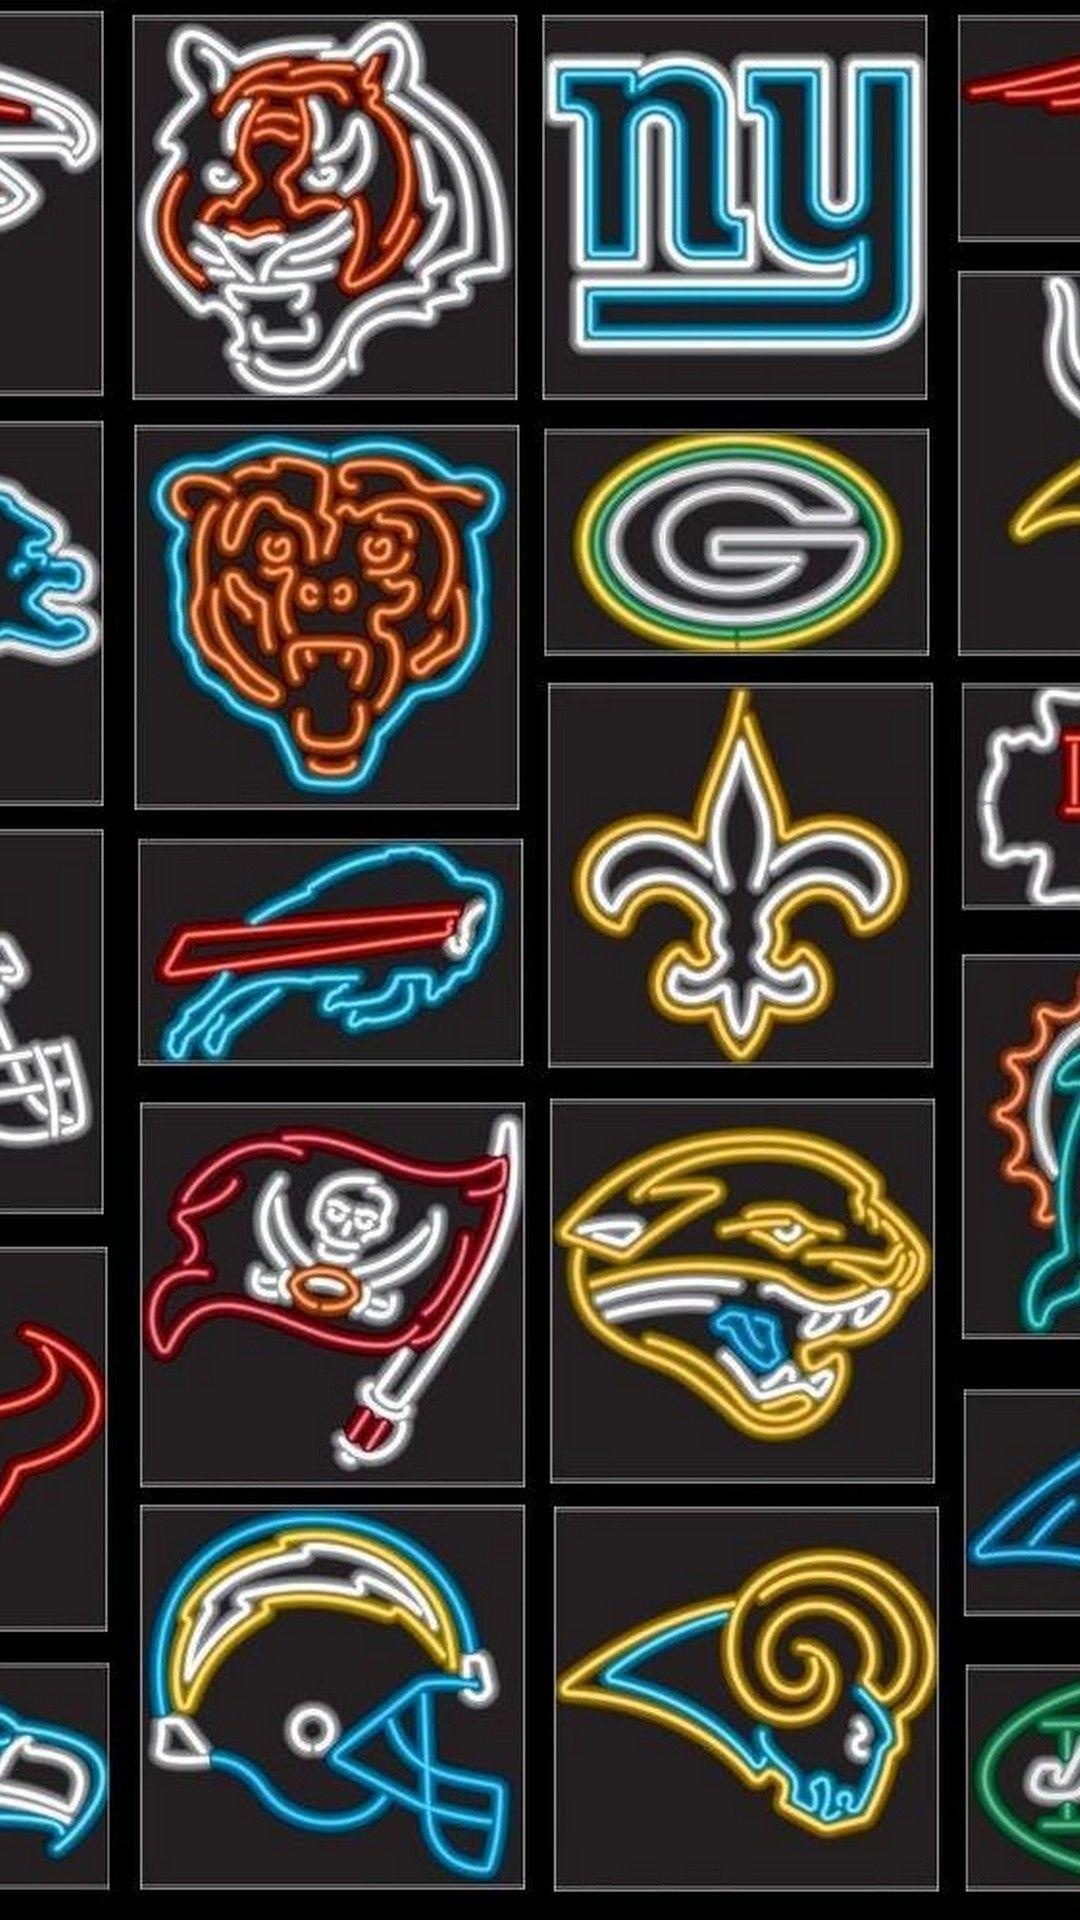 Cool Football Wallpaper Ios cool football in 2020 Hd